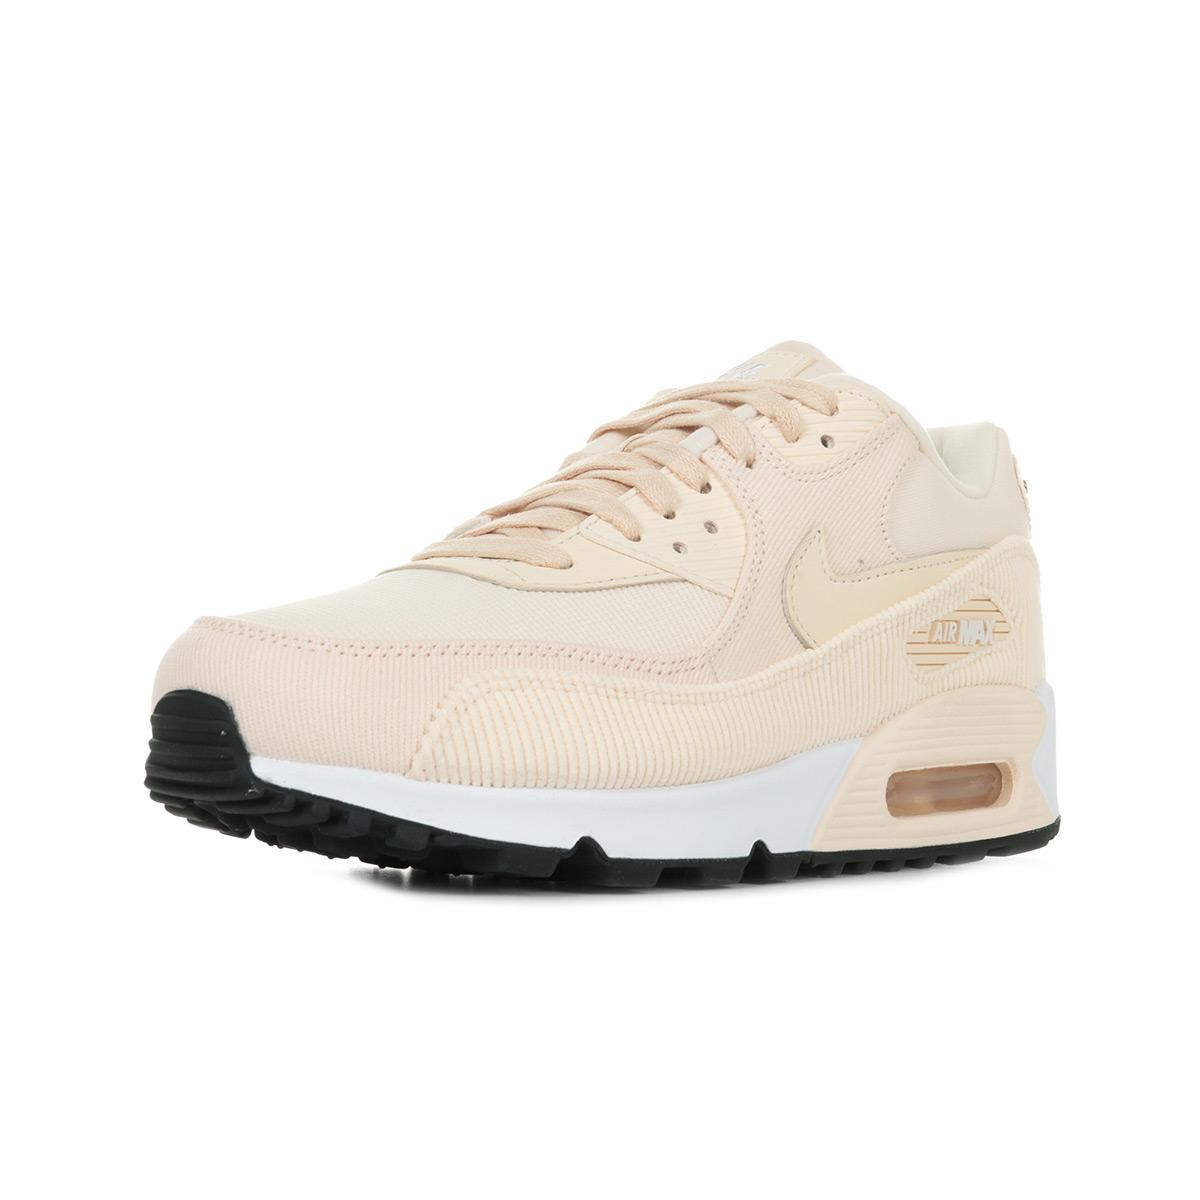 huge discount 7f9ac 08c47 Nike Wmns Air Max 90 Lea ...